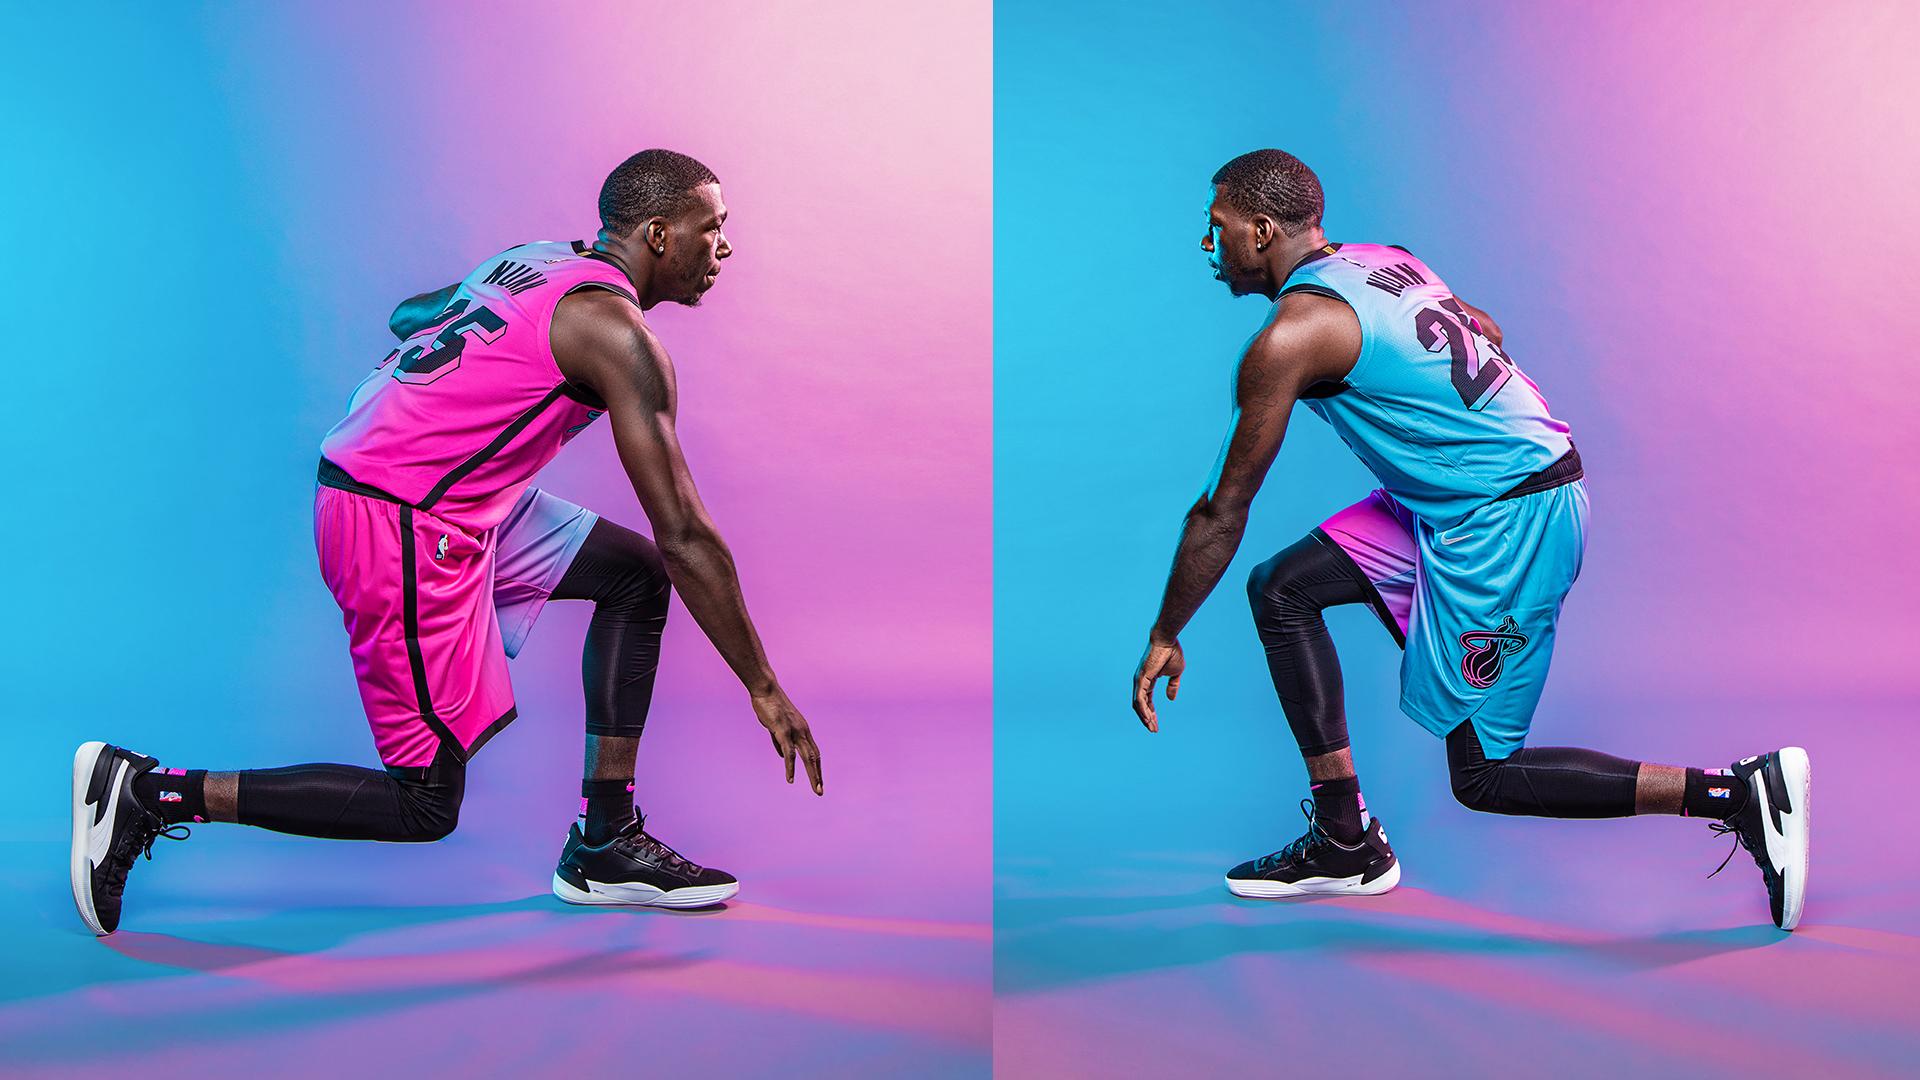 NBA City Edition Uniform